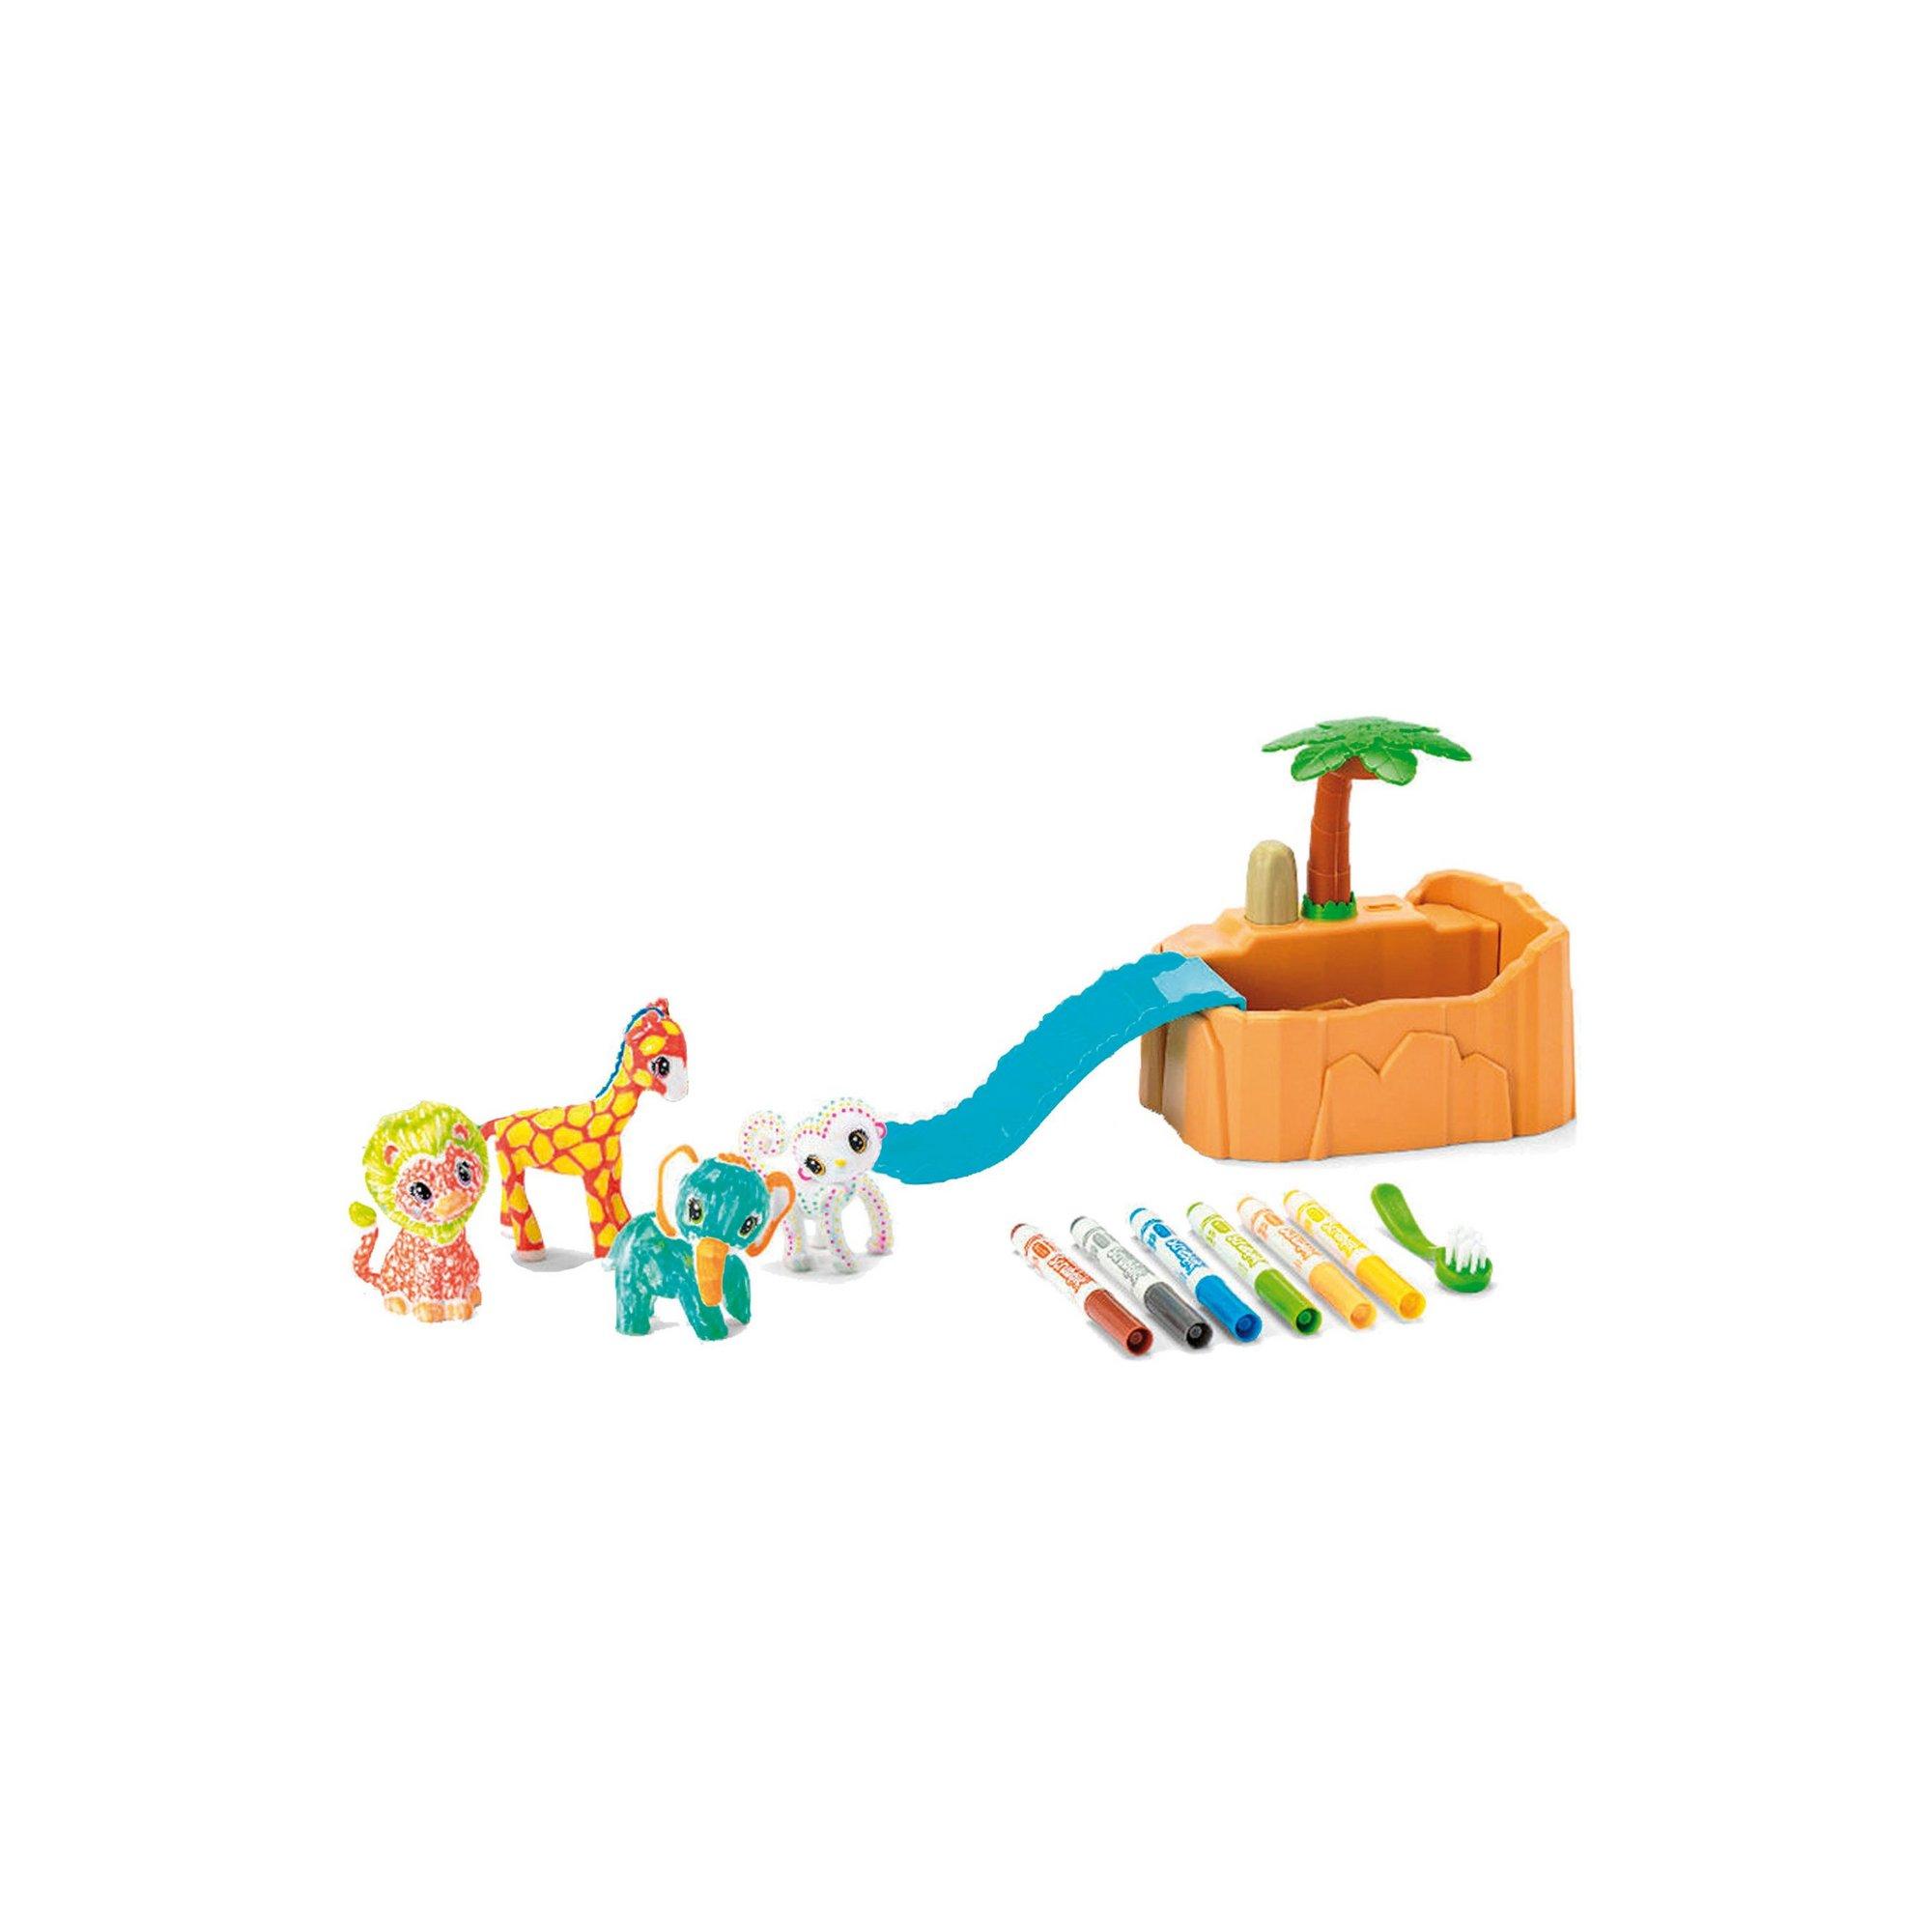 Image of Crayola Washimals Safari Play Set